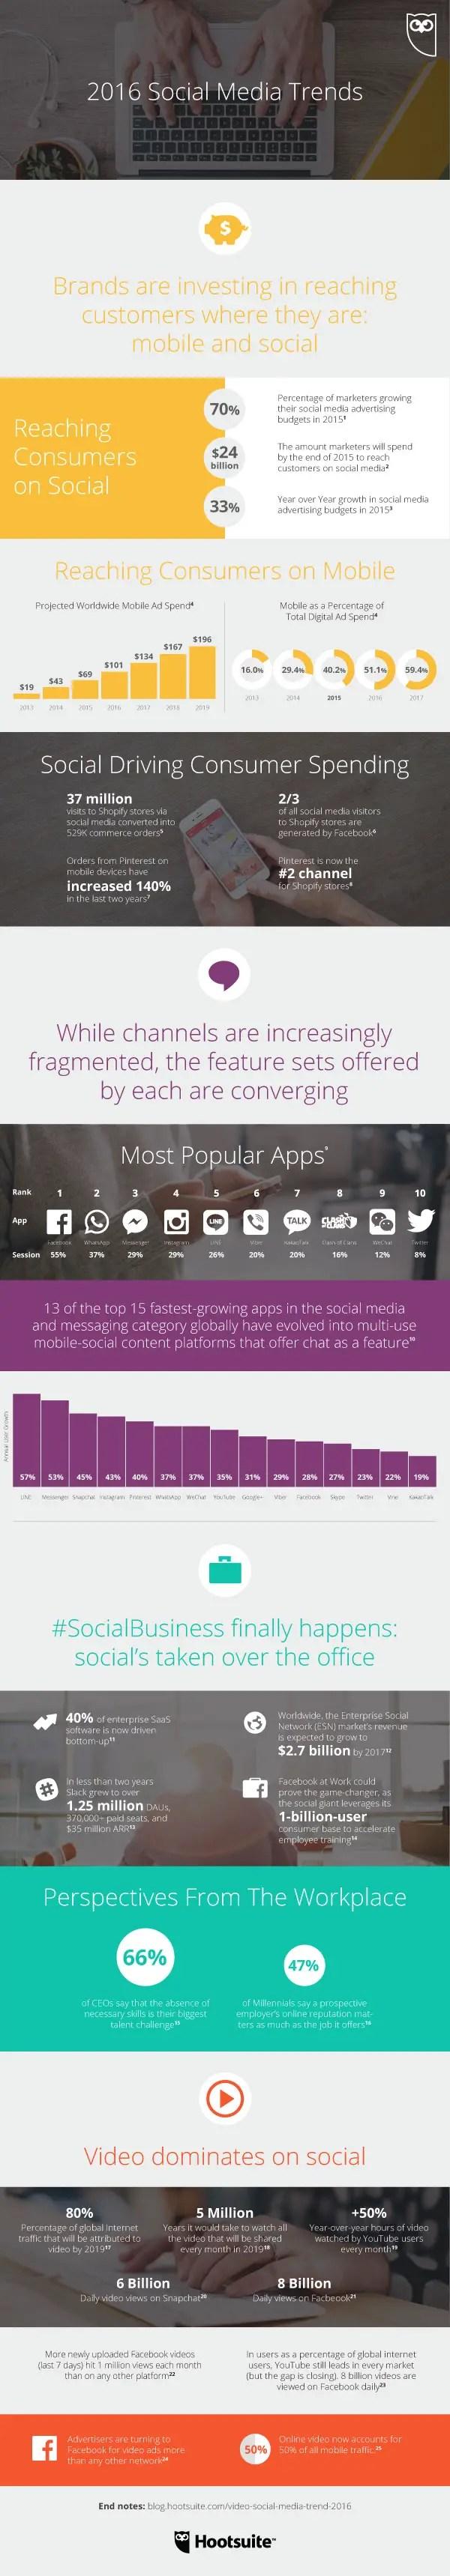 2016-social-media-trends-infographic